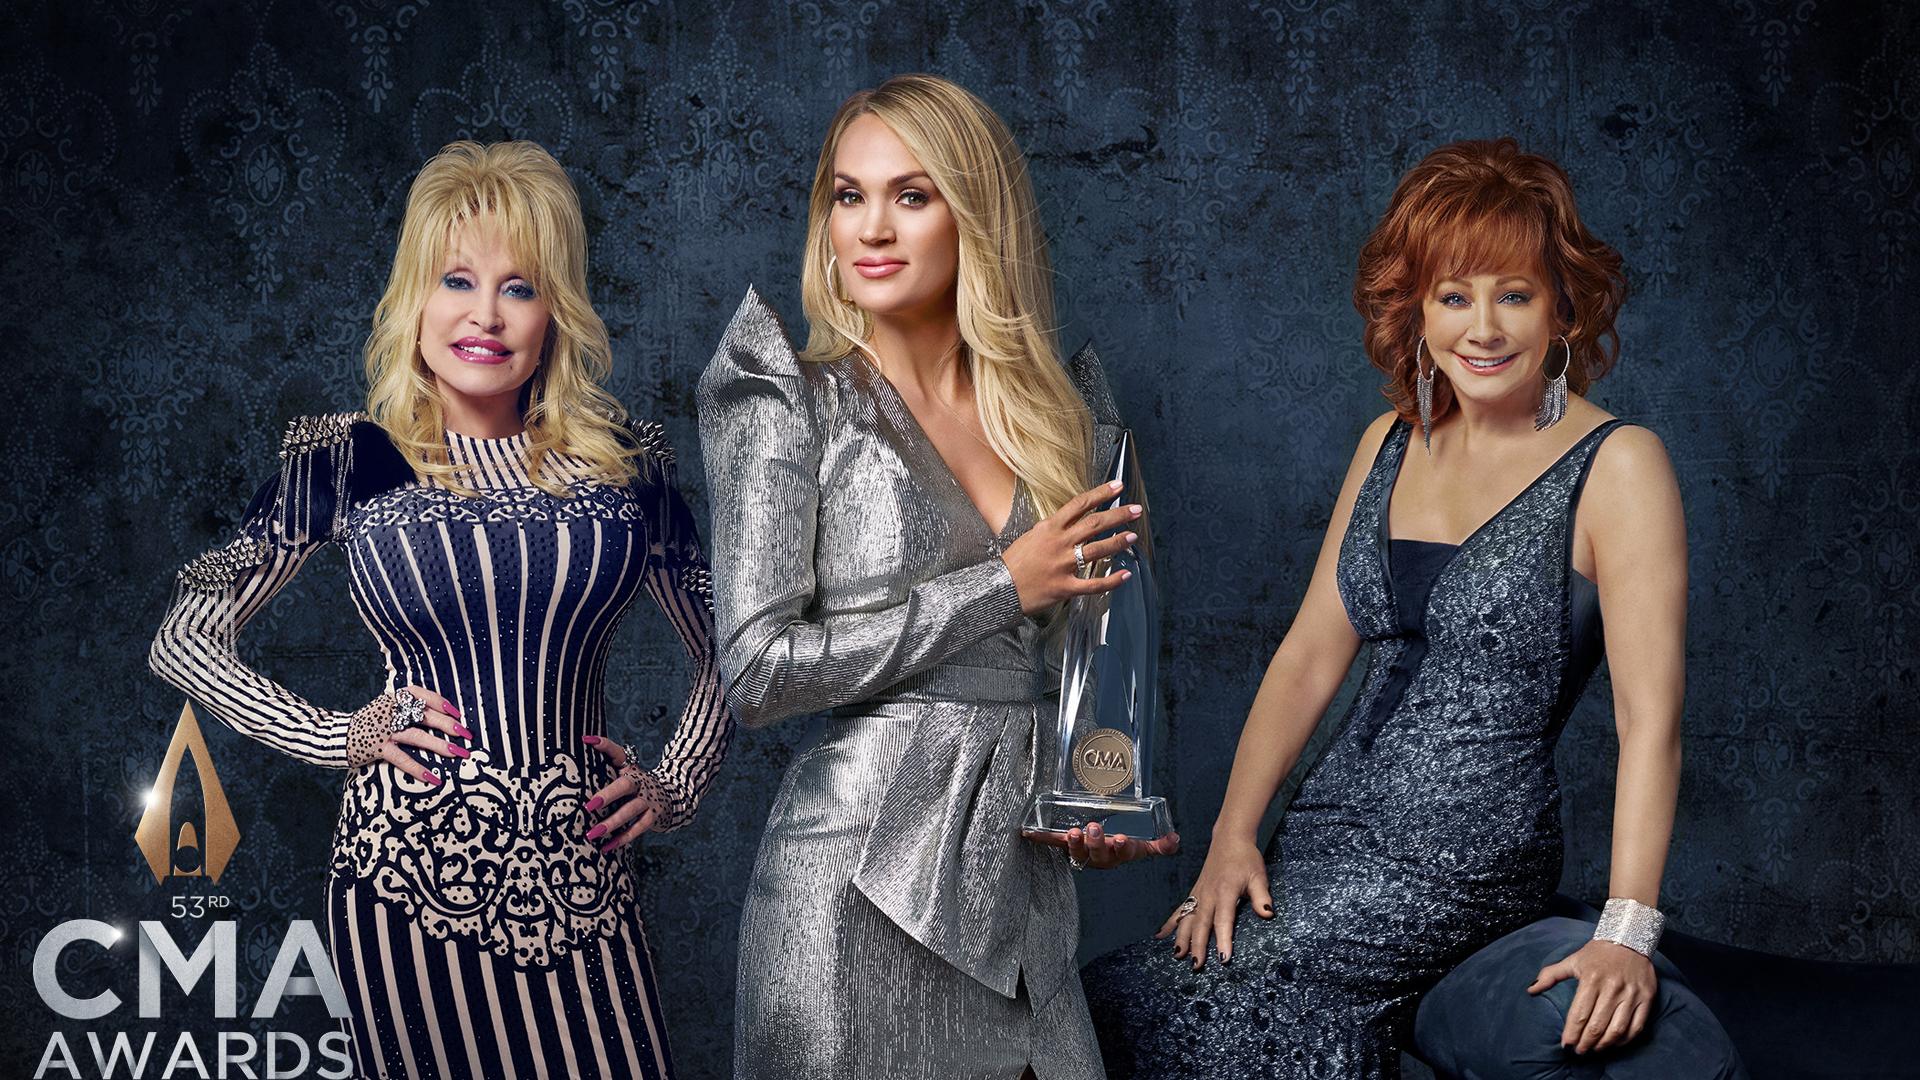 53rd Cma Awards Cma Awards Country Music Stars Country Music